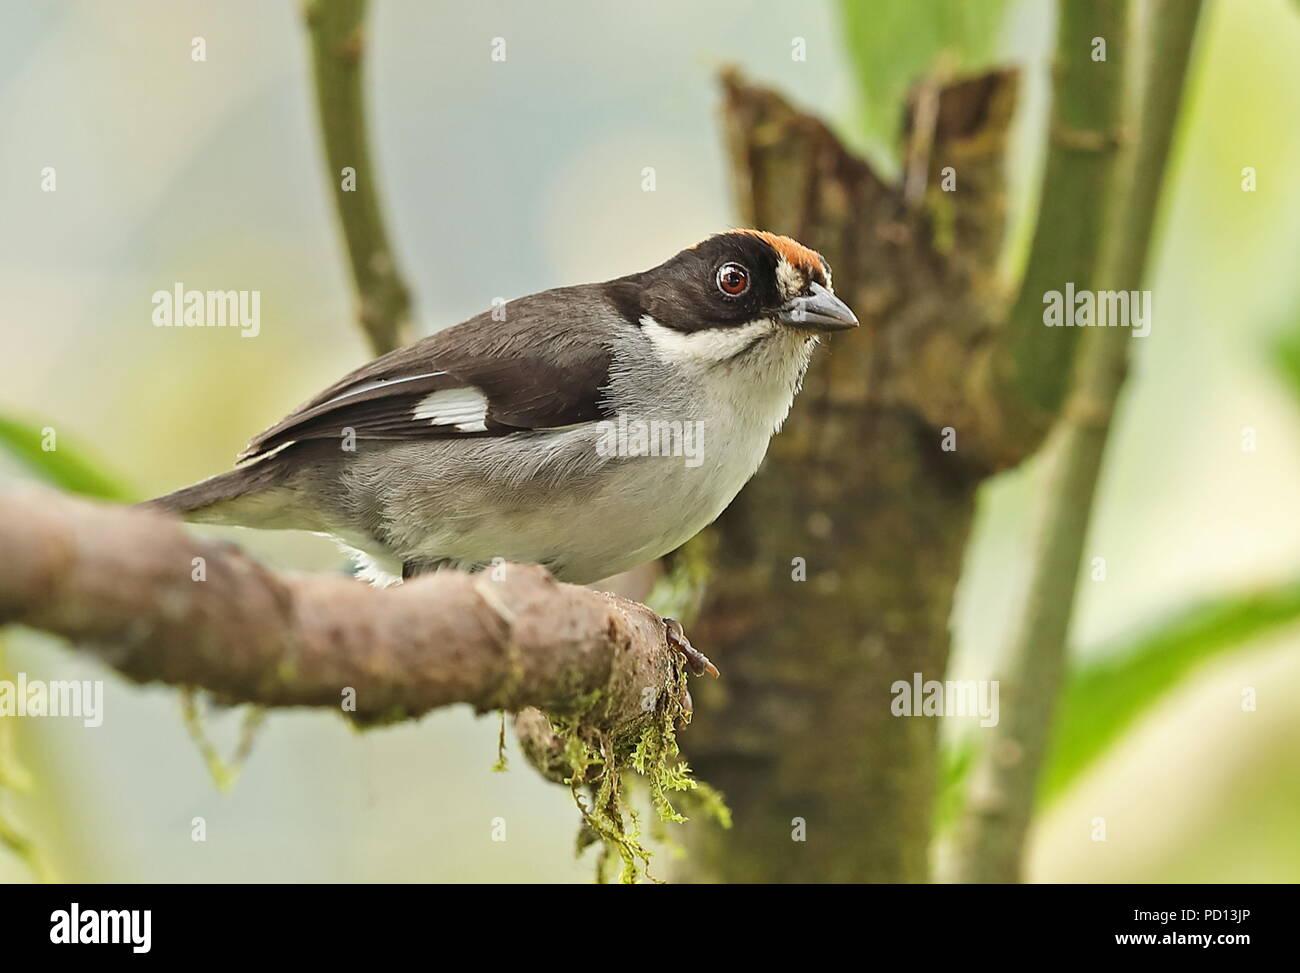 White-winged Brush-finch (Atlapetes leucopterus leucopterus) adult perched on branch  Nono-Mindo road, Ecuador                  February - Stock Image